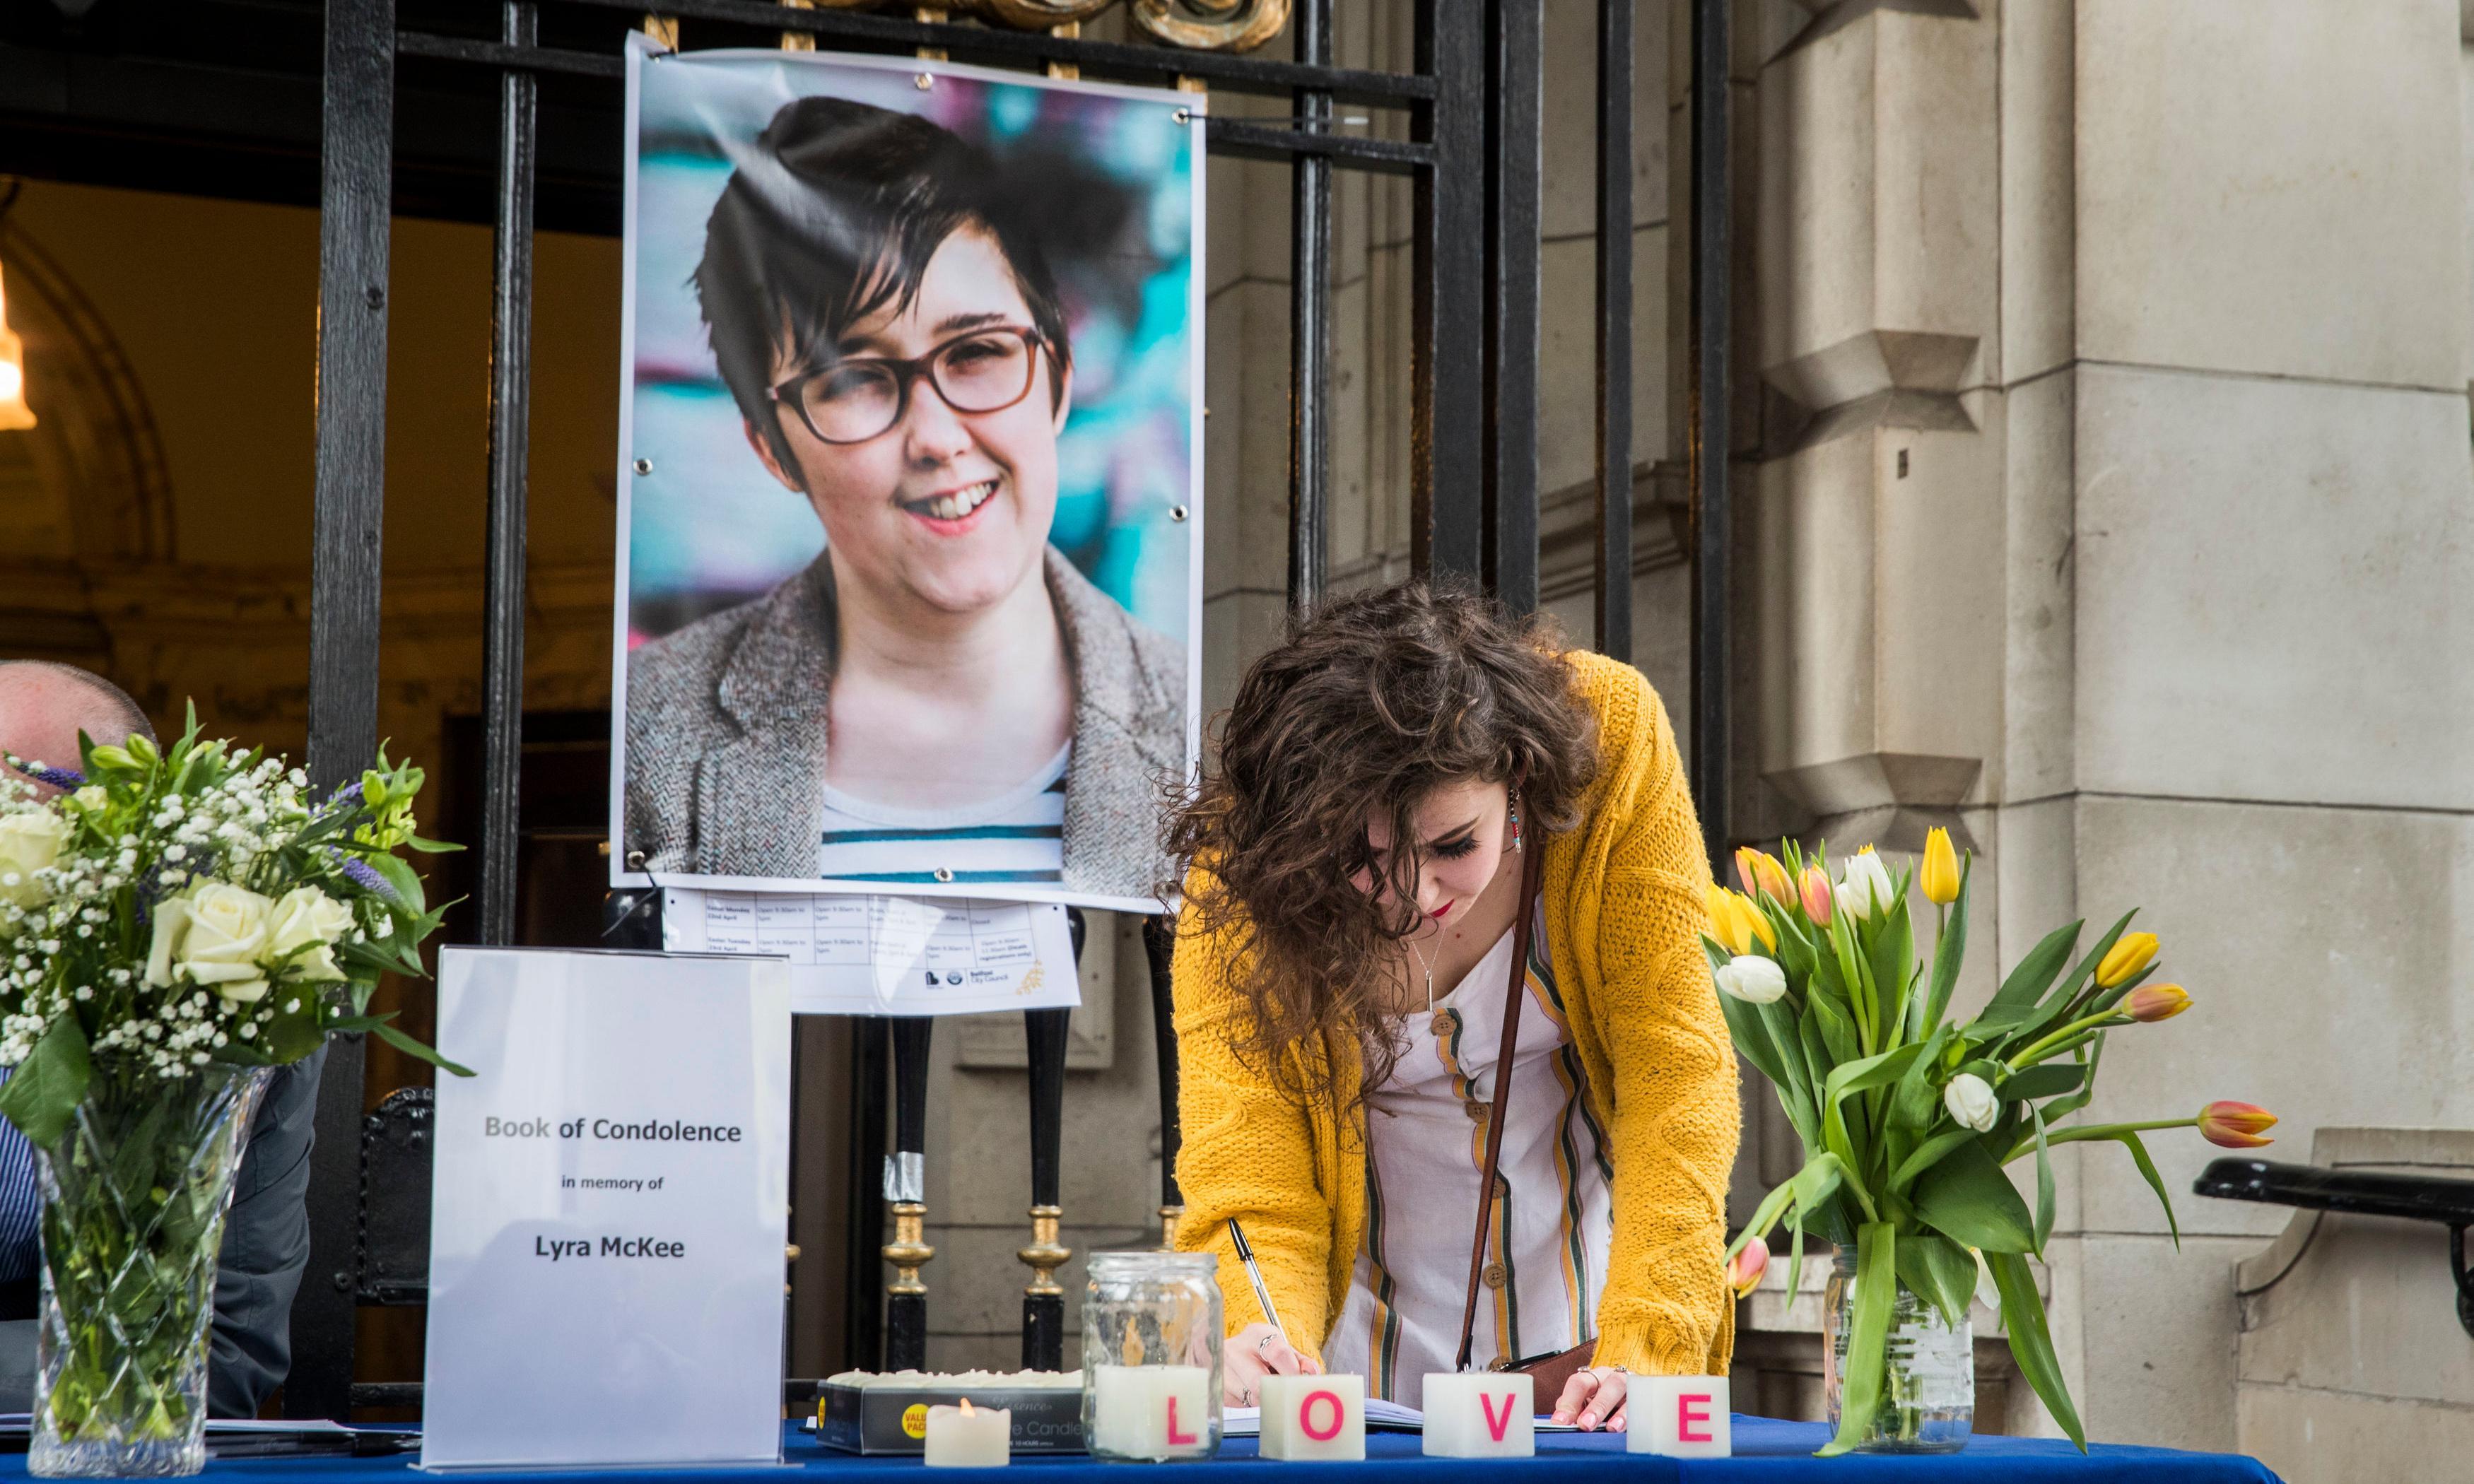 Lyra McKee killing: 'New breed of terrorism' in Northern Ireland, says PSNI